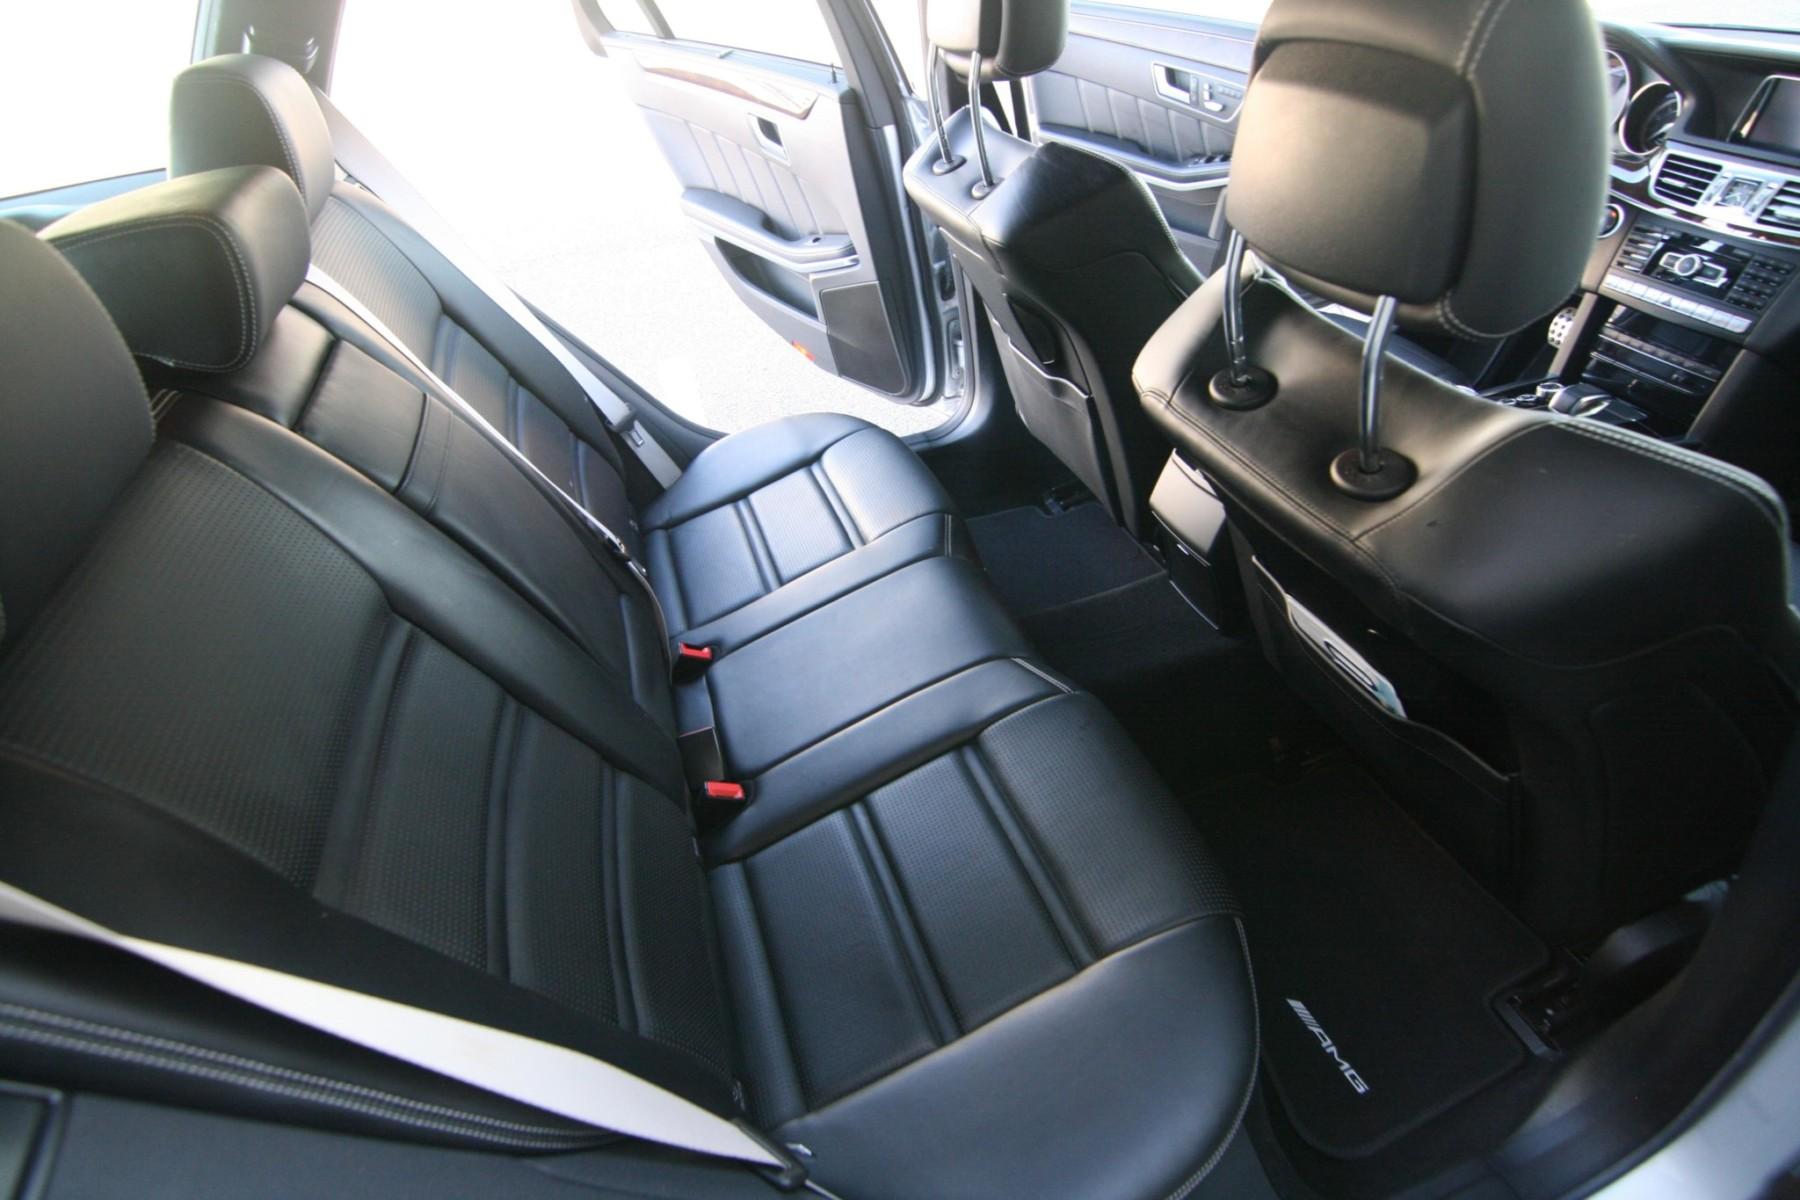 Mercedes-Benz E63 S AMG 4MATIC Wagon 11